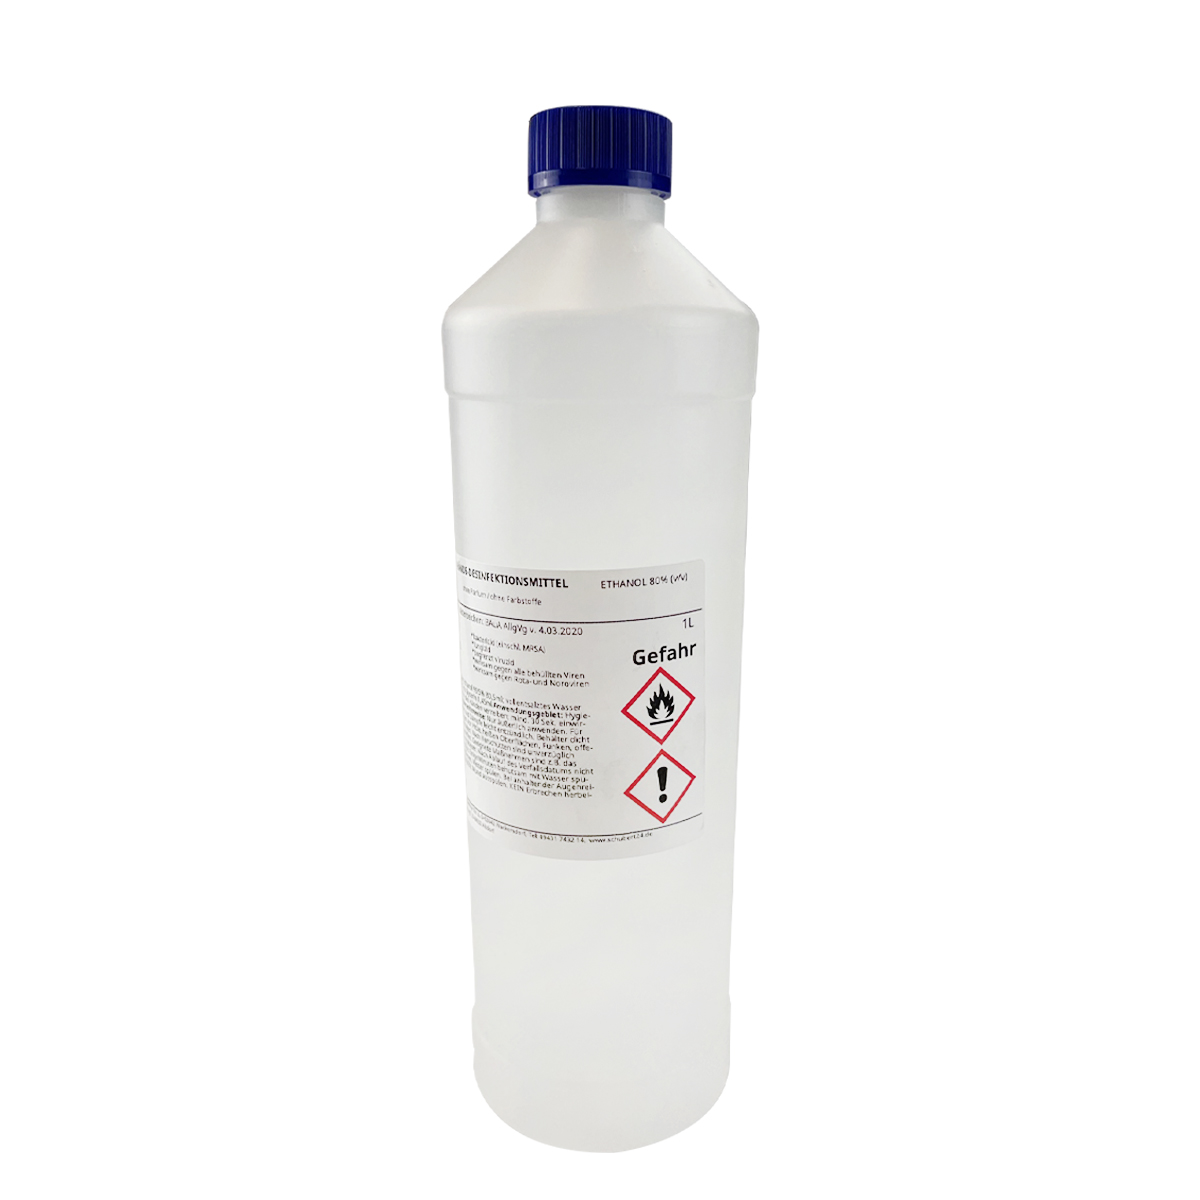 Händedesinfektion - Schubert desINFEKTion - 1000 ml/1 Liter